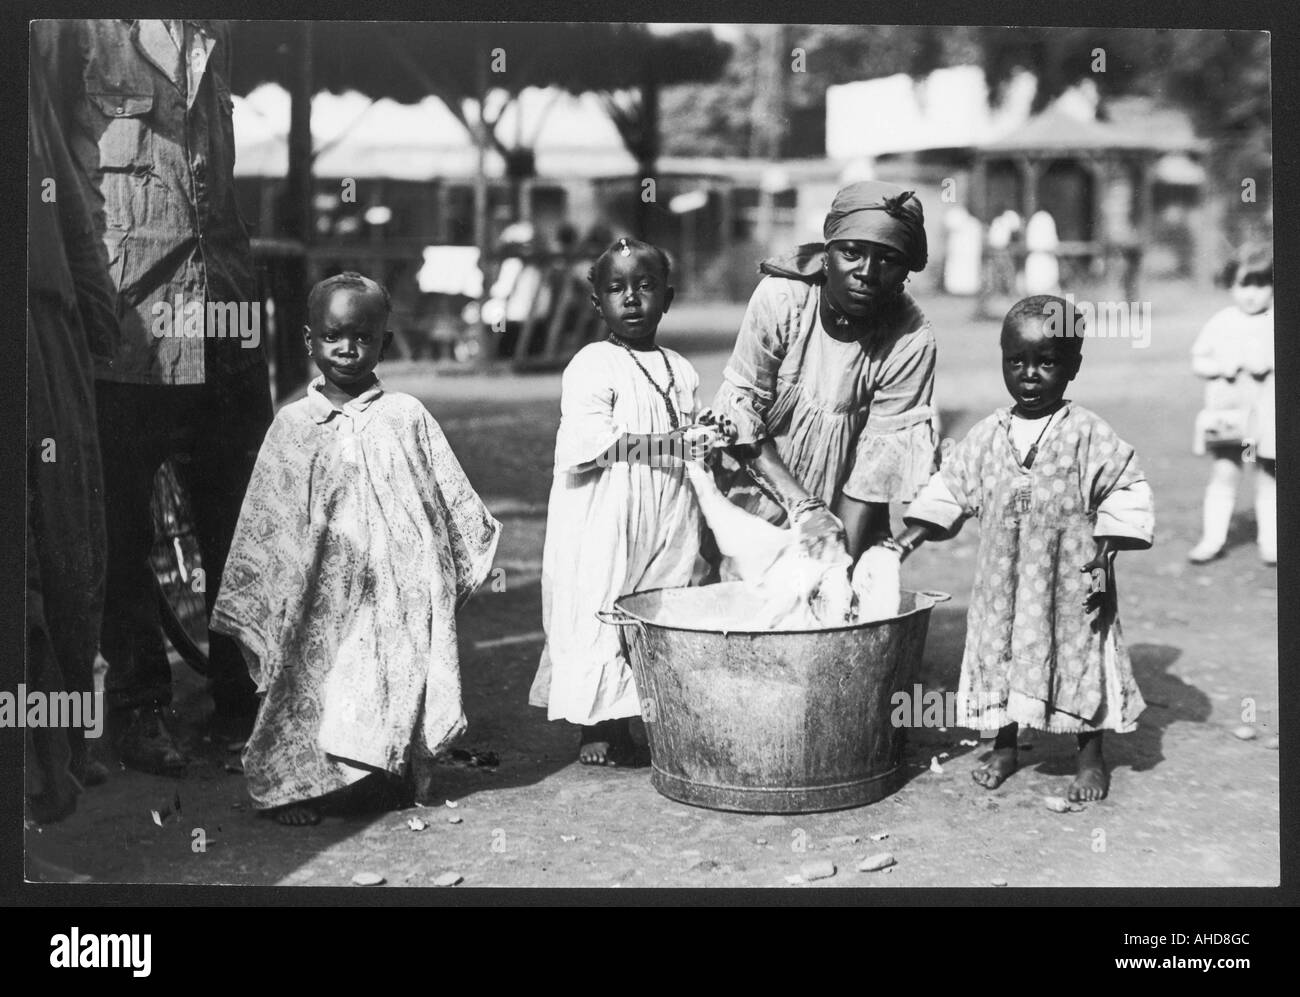 Washing Day  Nigeria - Stock Image